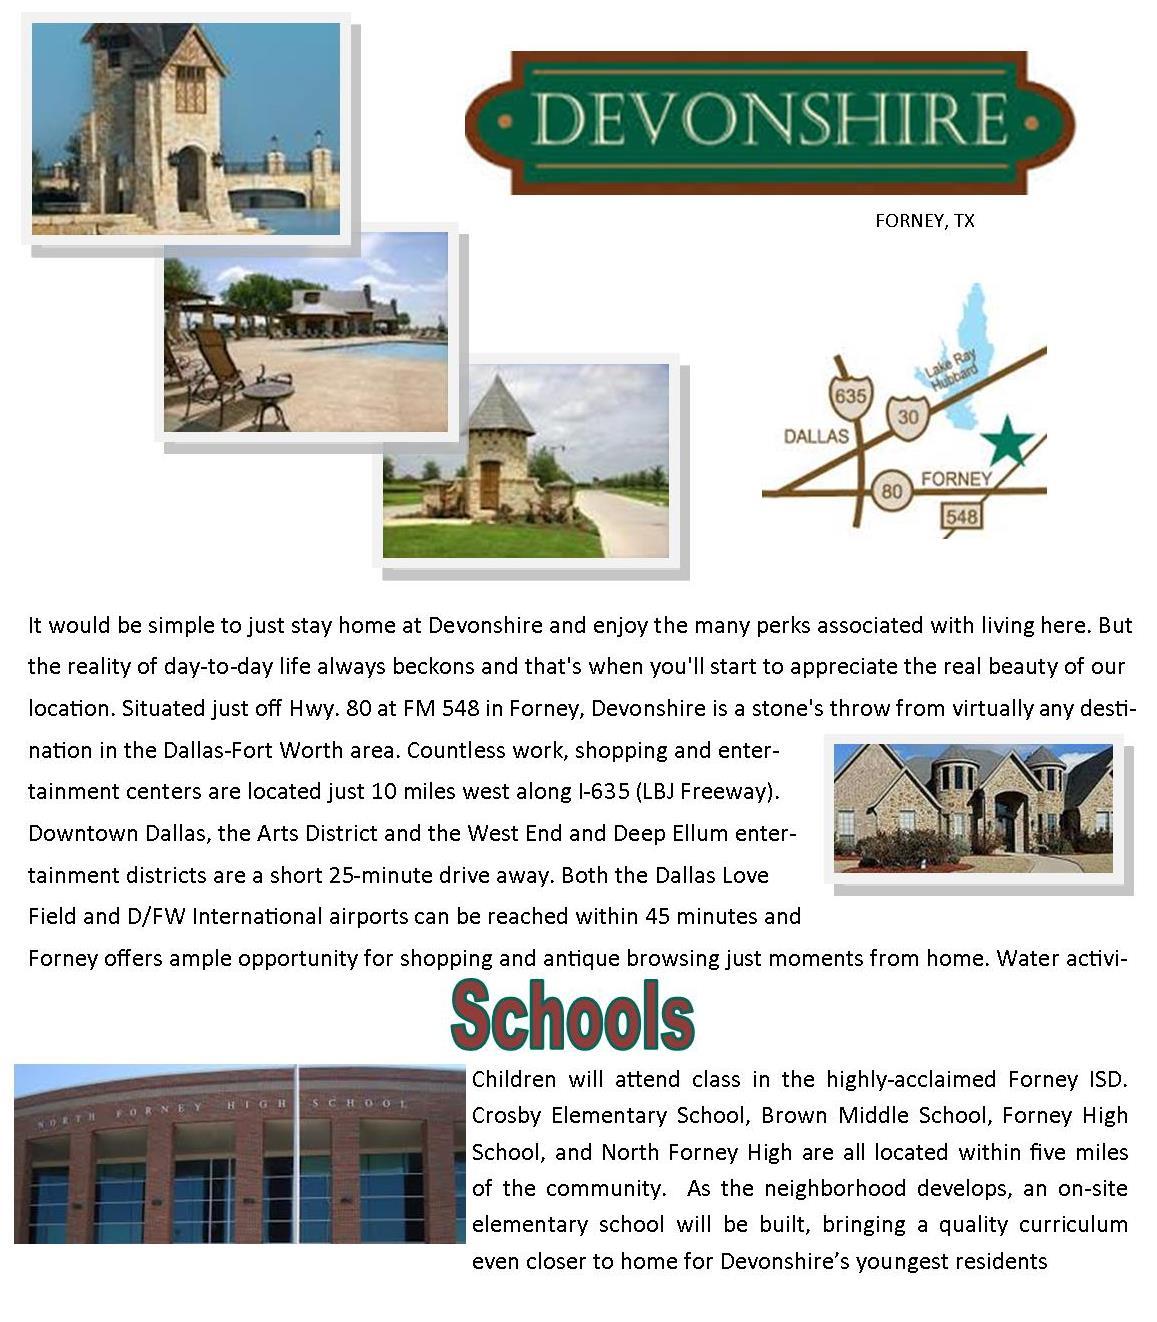 Devonshire Webpage